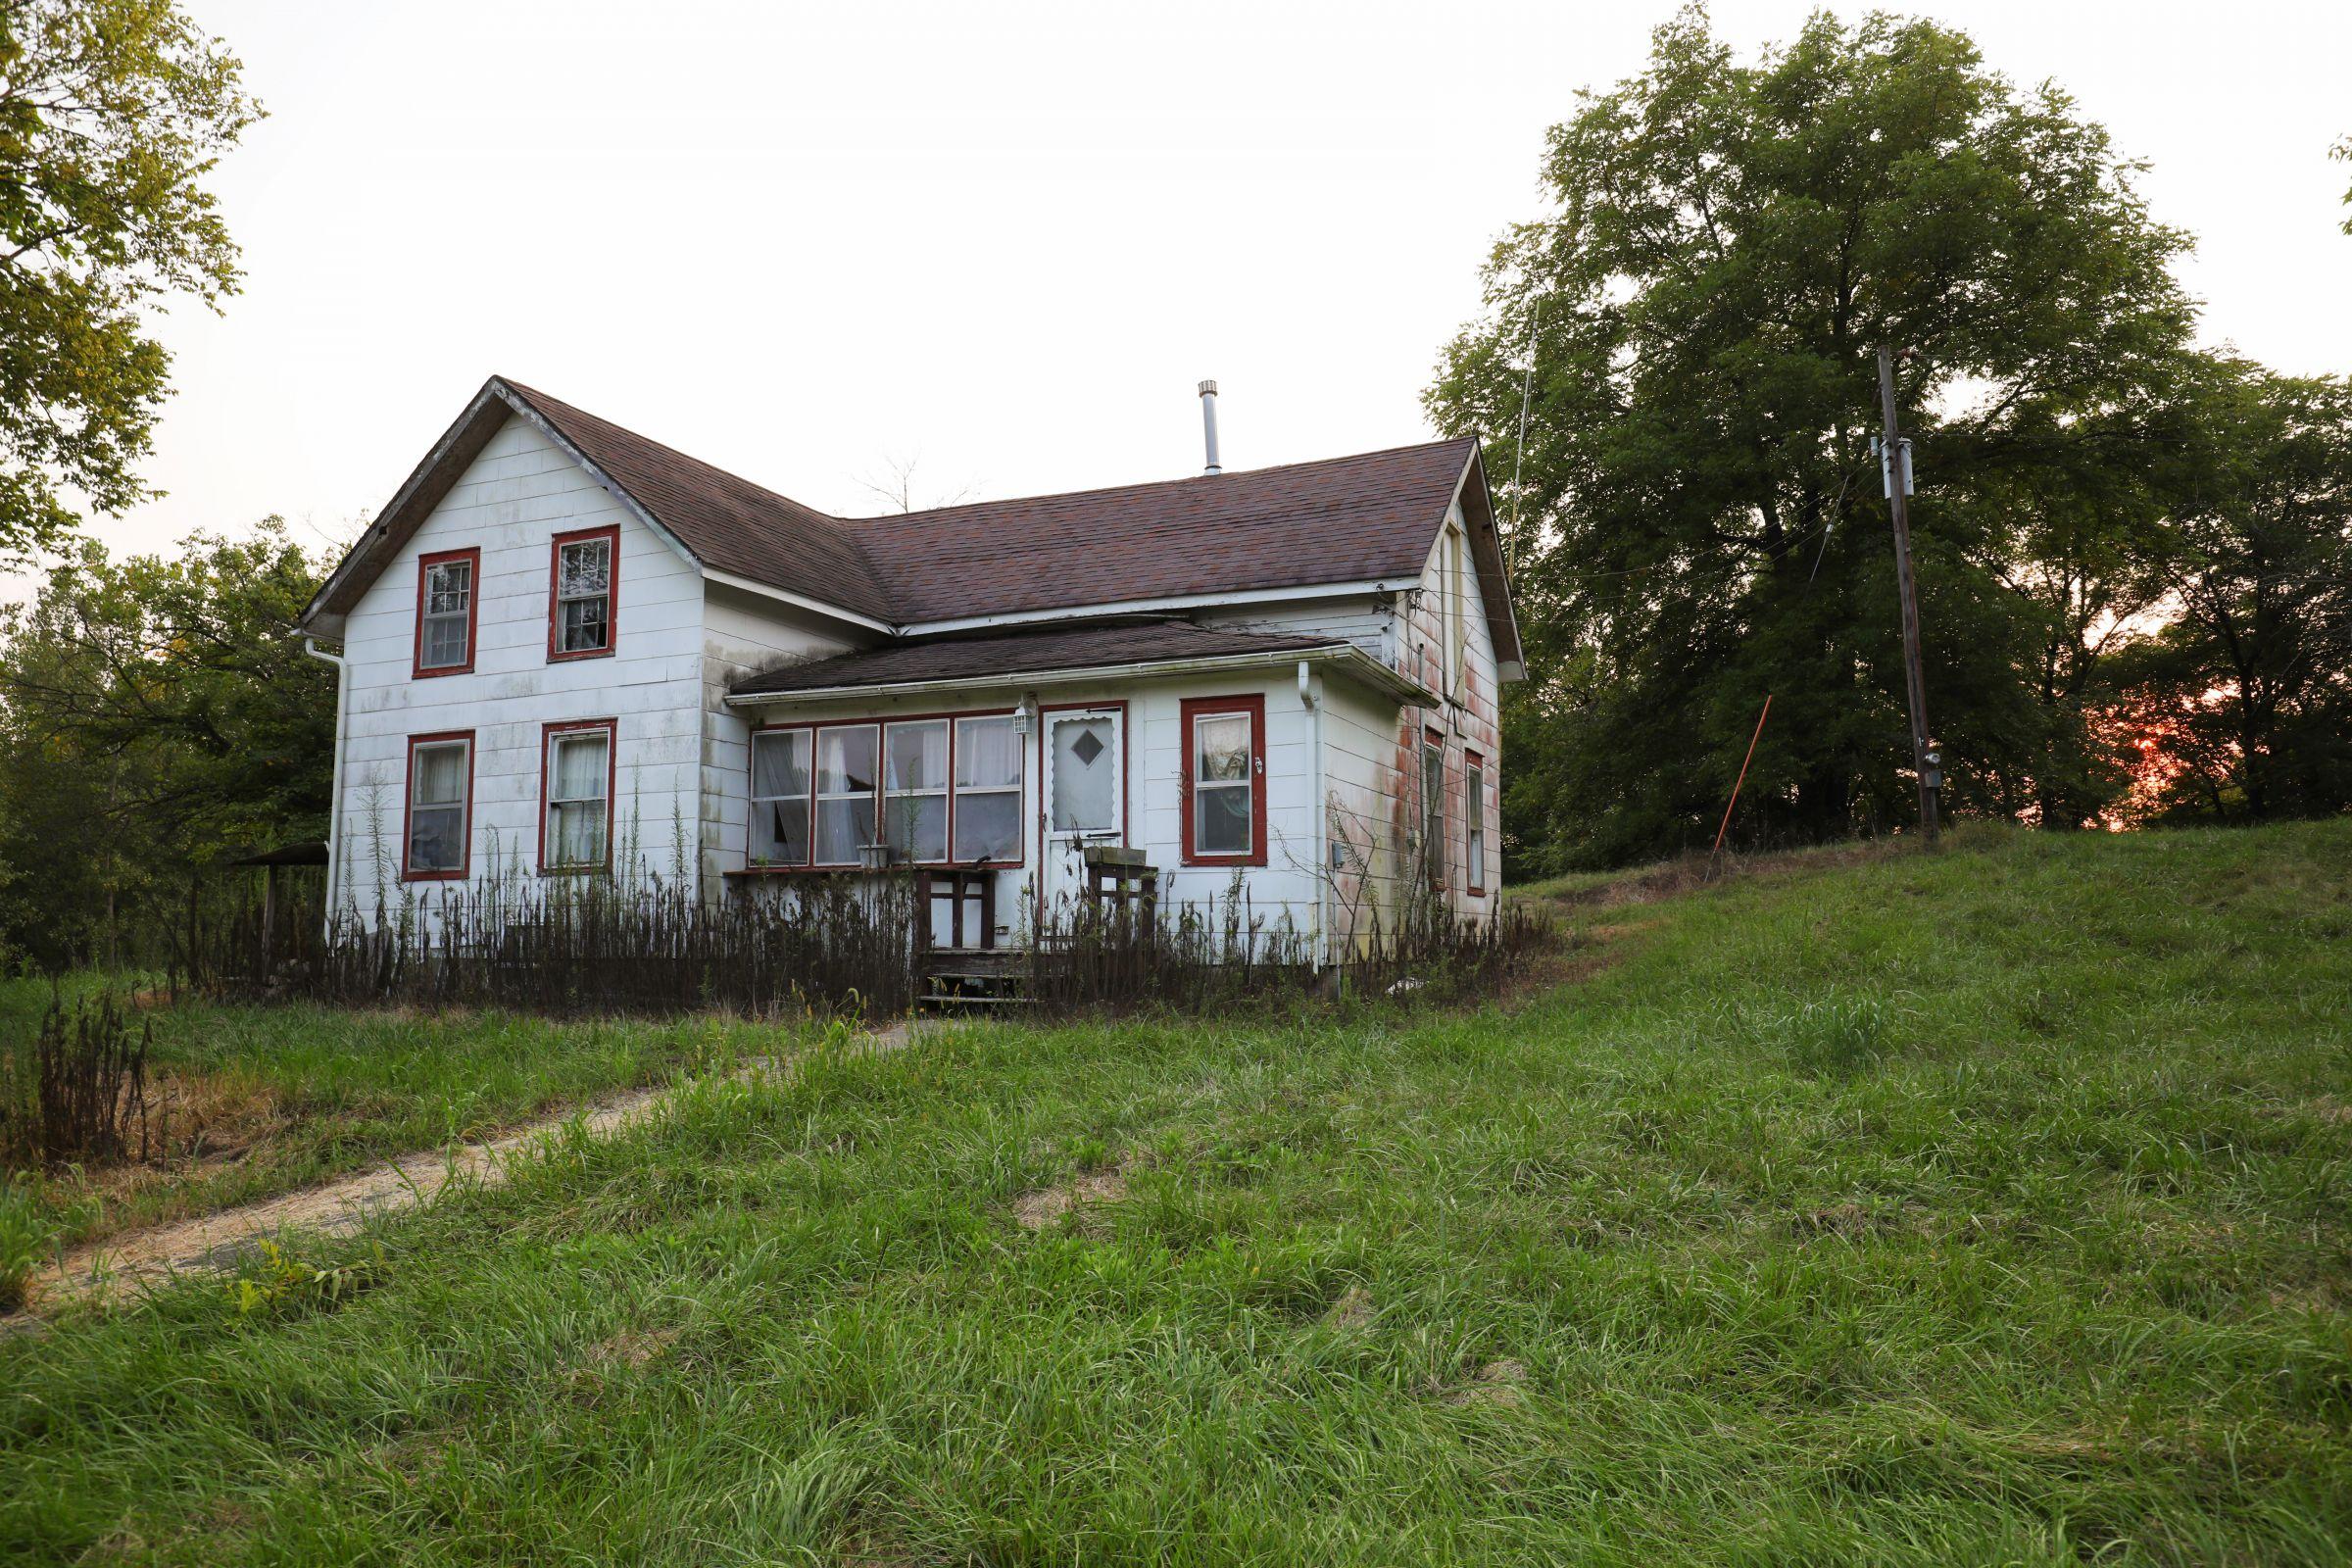 land-lee-county-iowa-328-acres-listing-number-15137-3-2020-08-27-174853.jpg